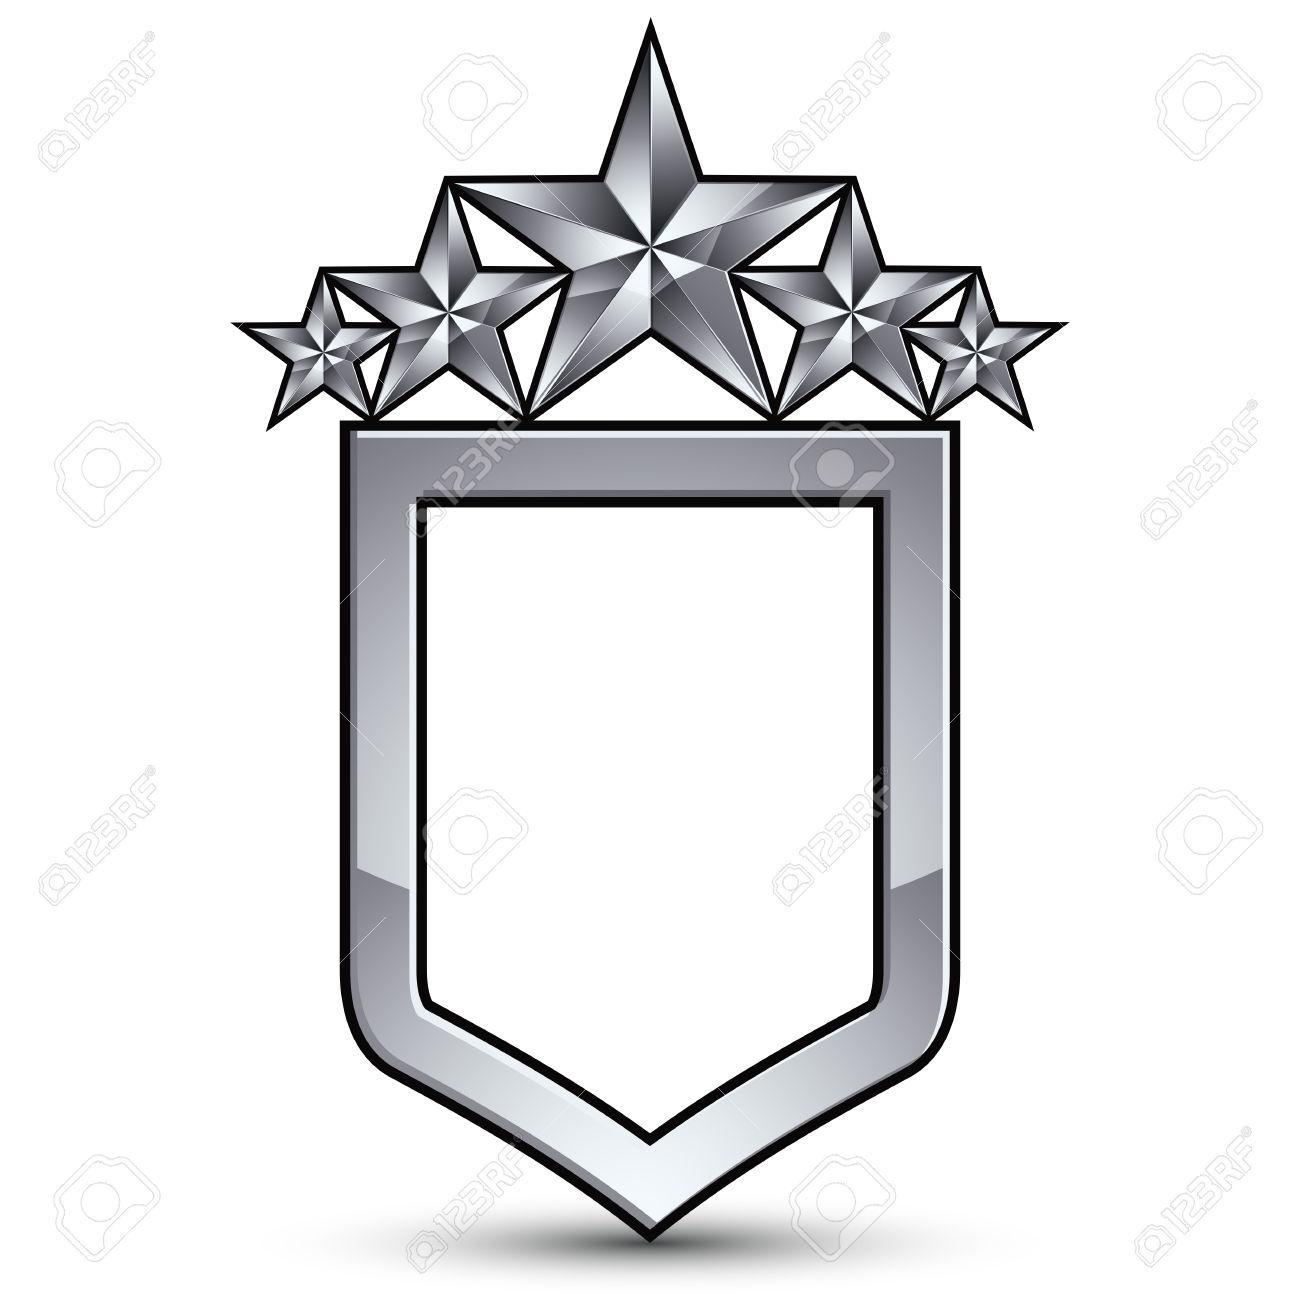 Festive Emblem With Silver Outline And Five Pentagonal Stars.